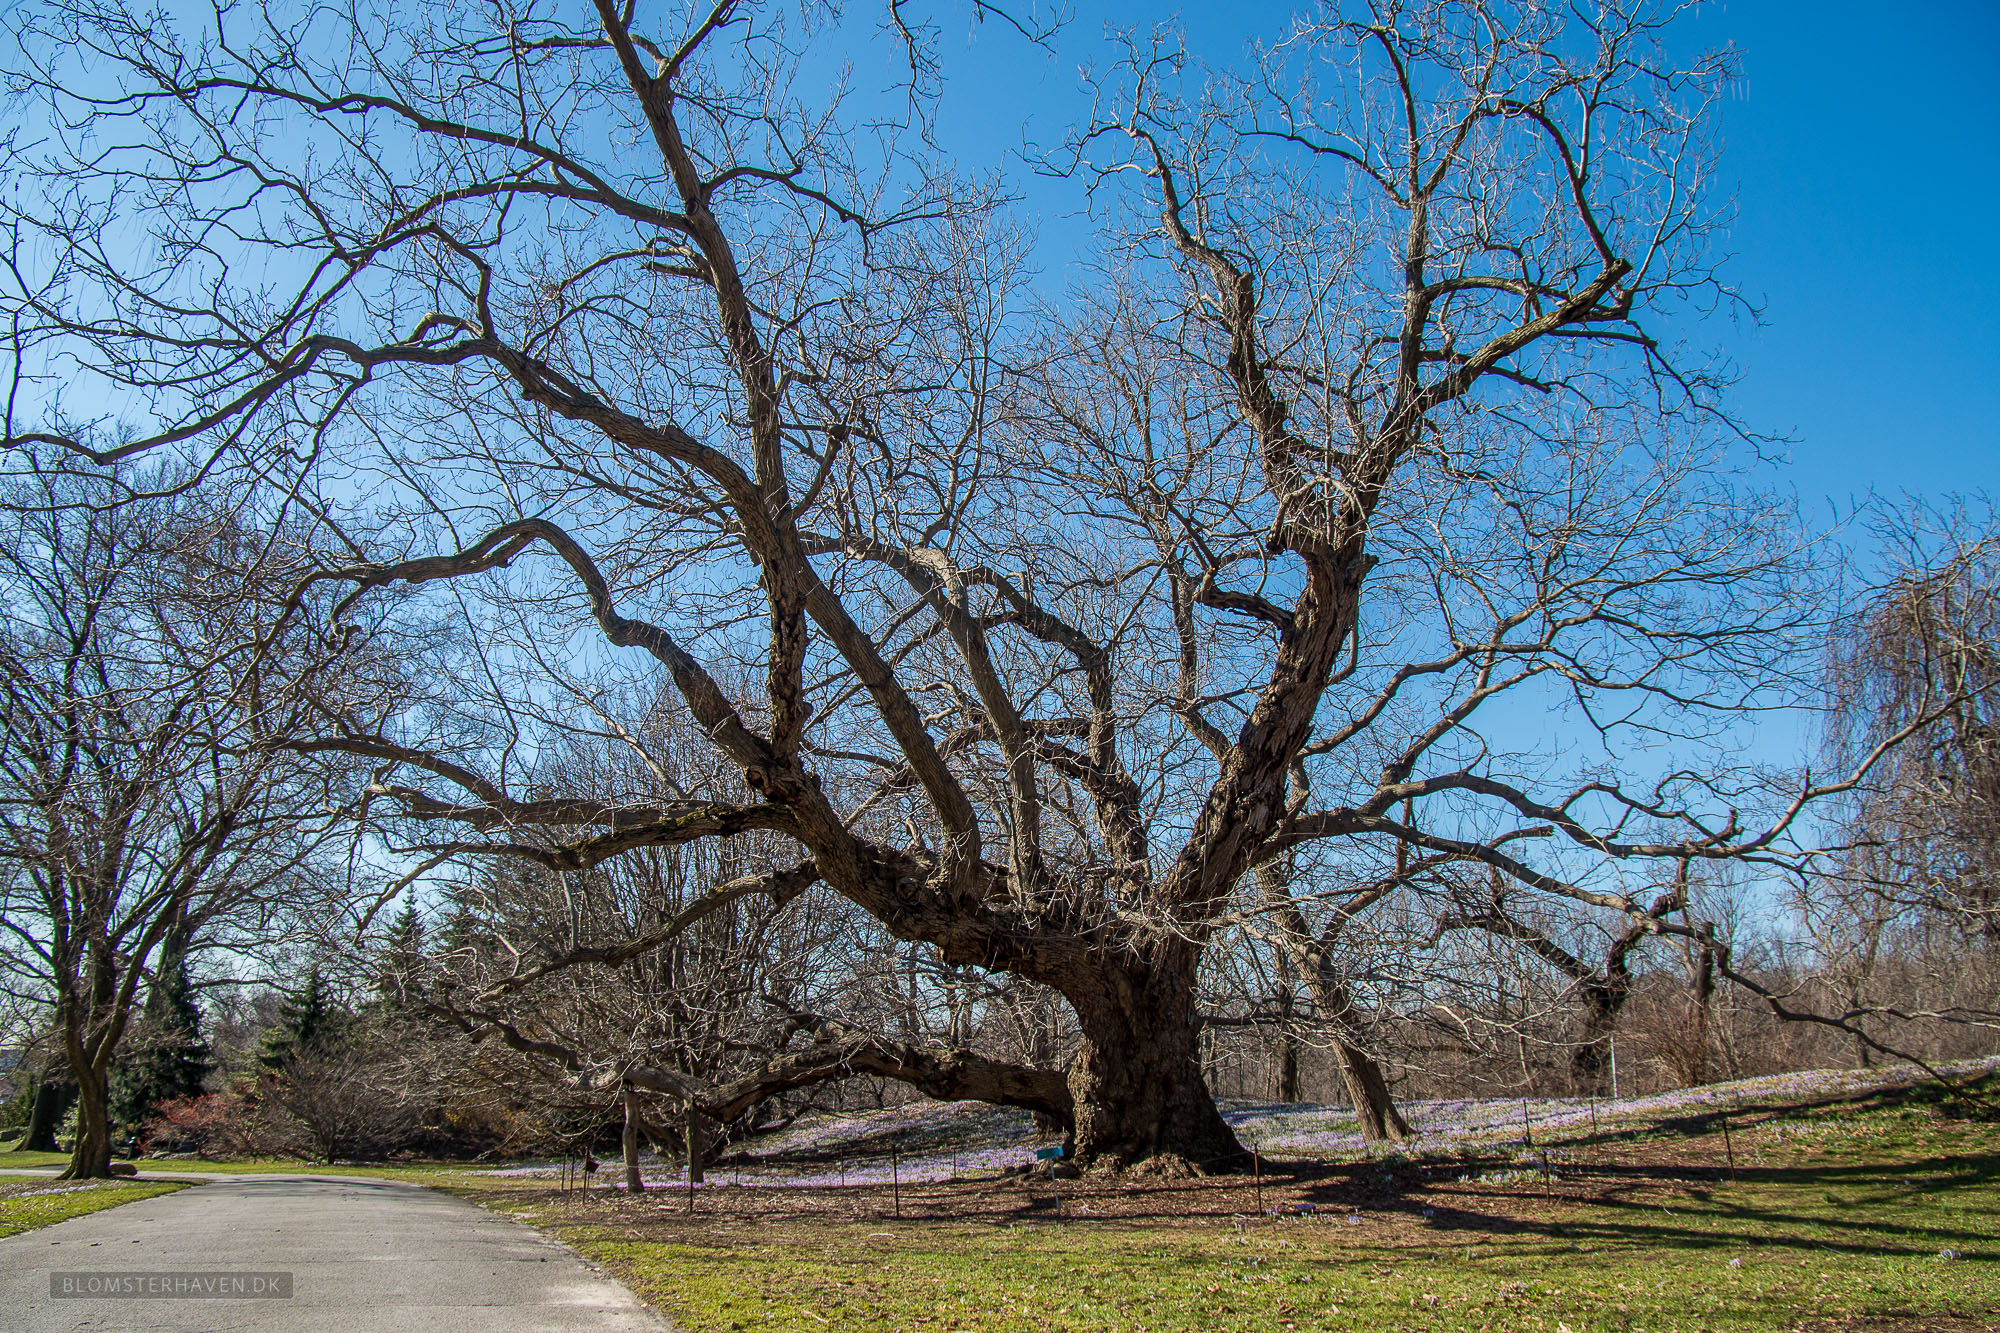 Et stort og gammel træ i Brooklyn Botanic Garden